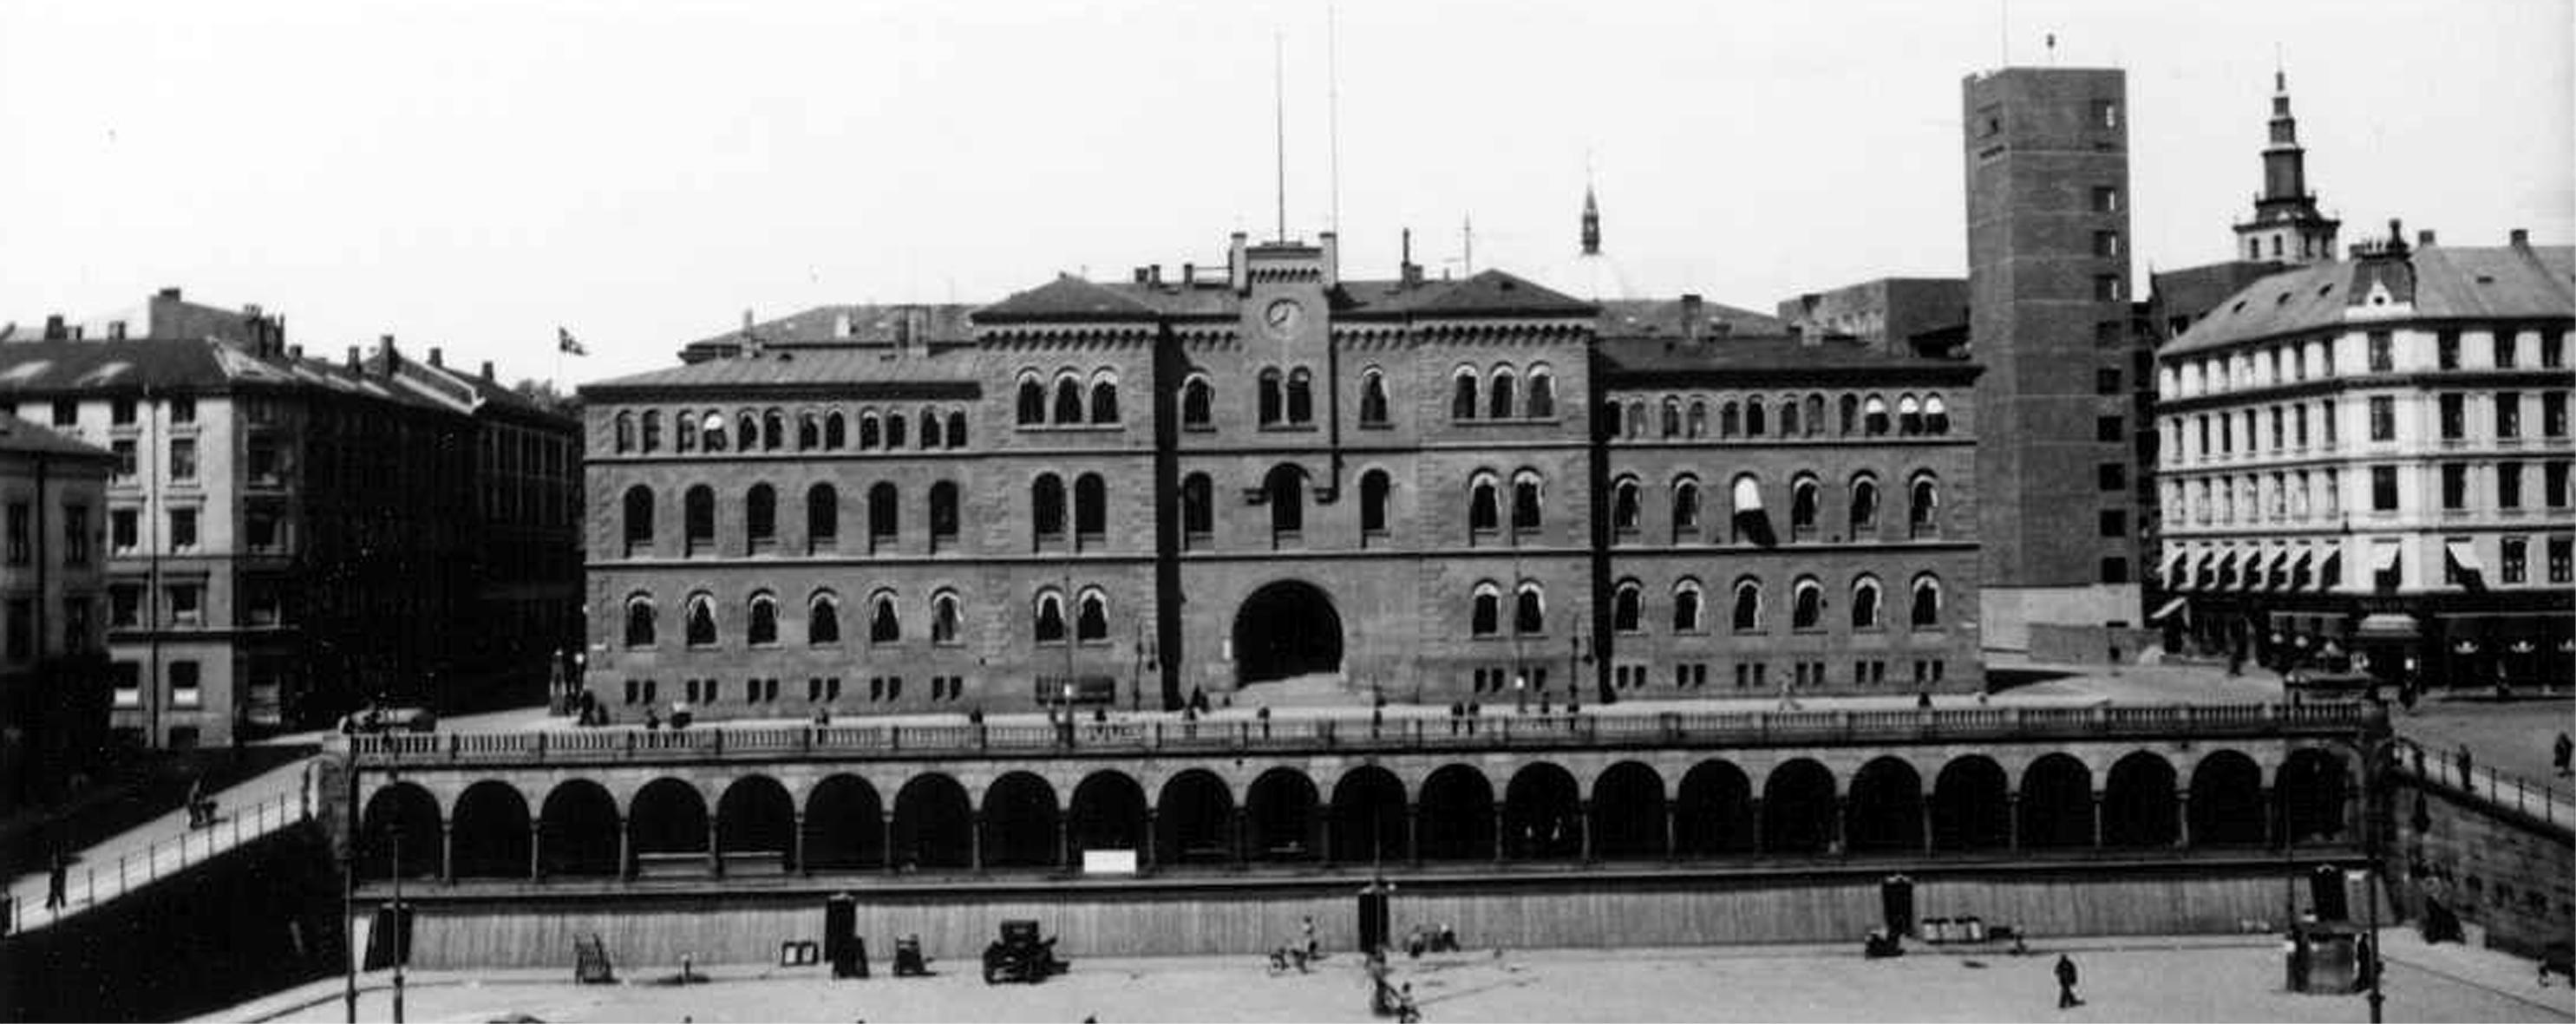 Yongstorget-med-nr.-19-1942